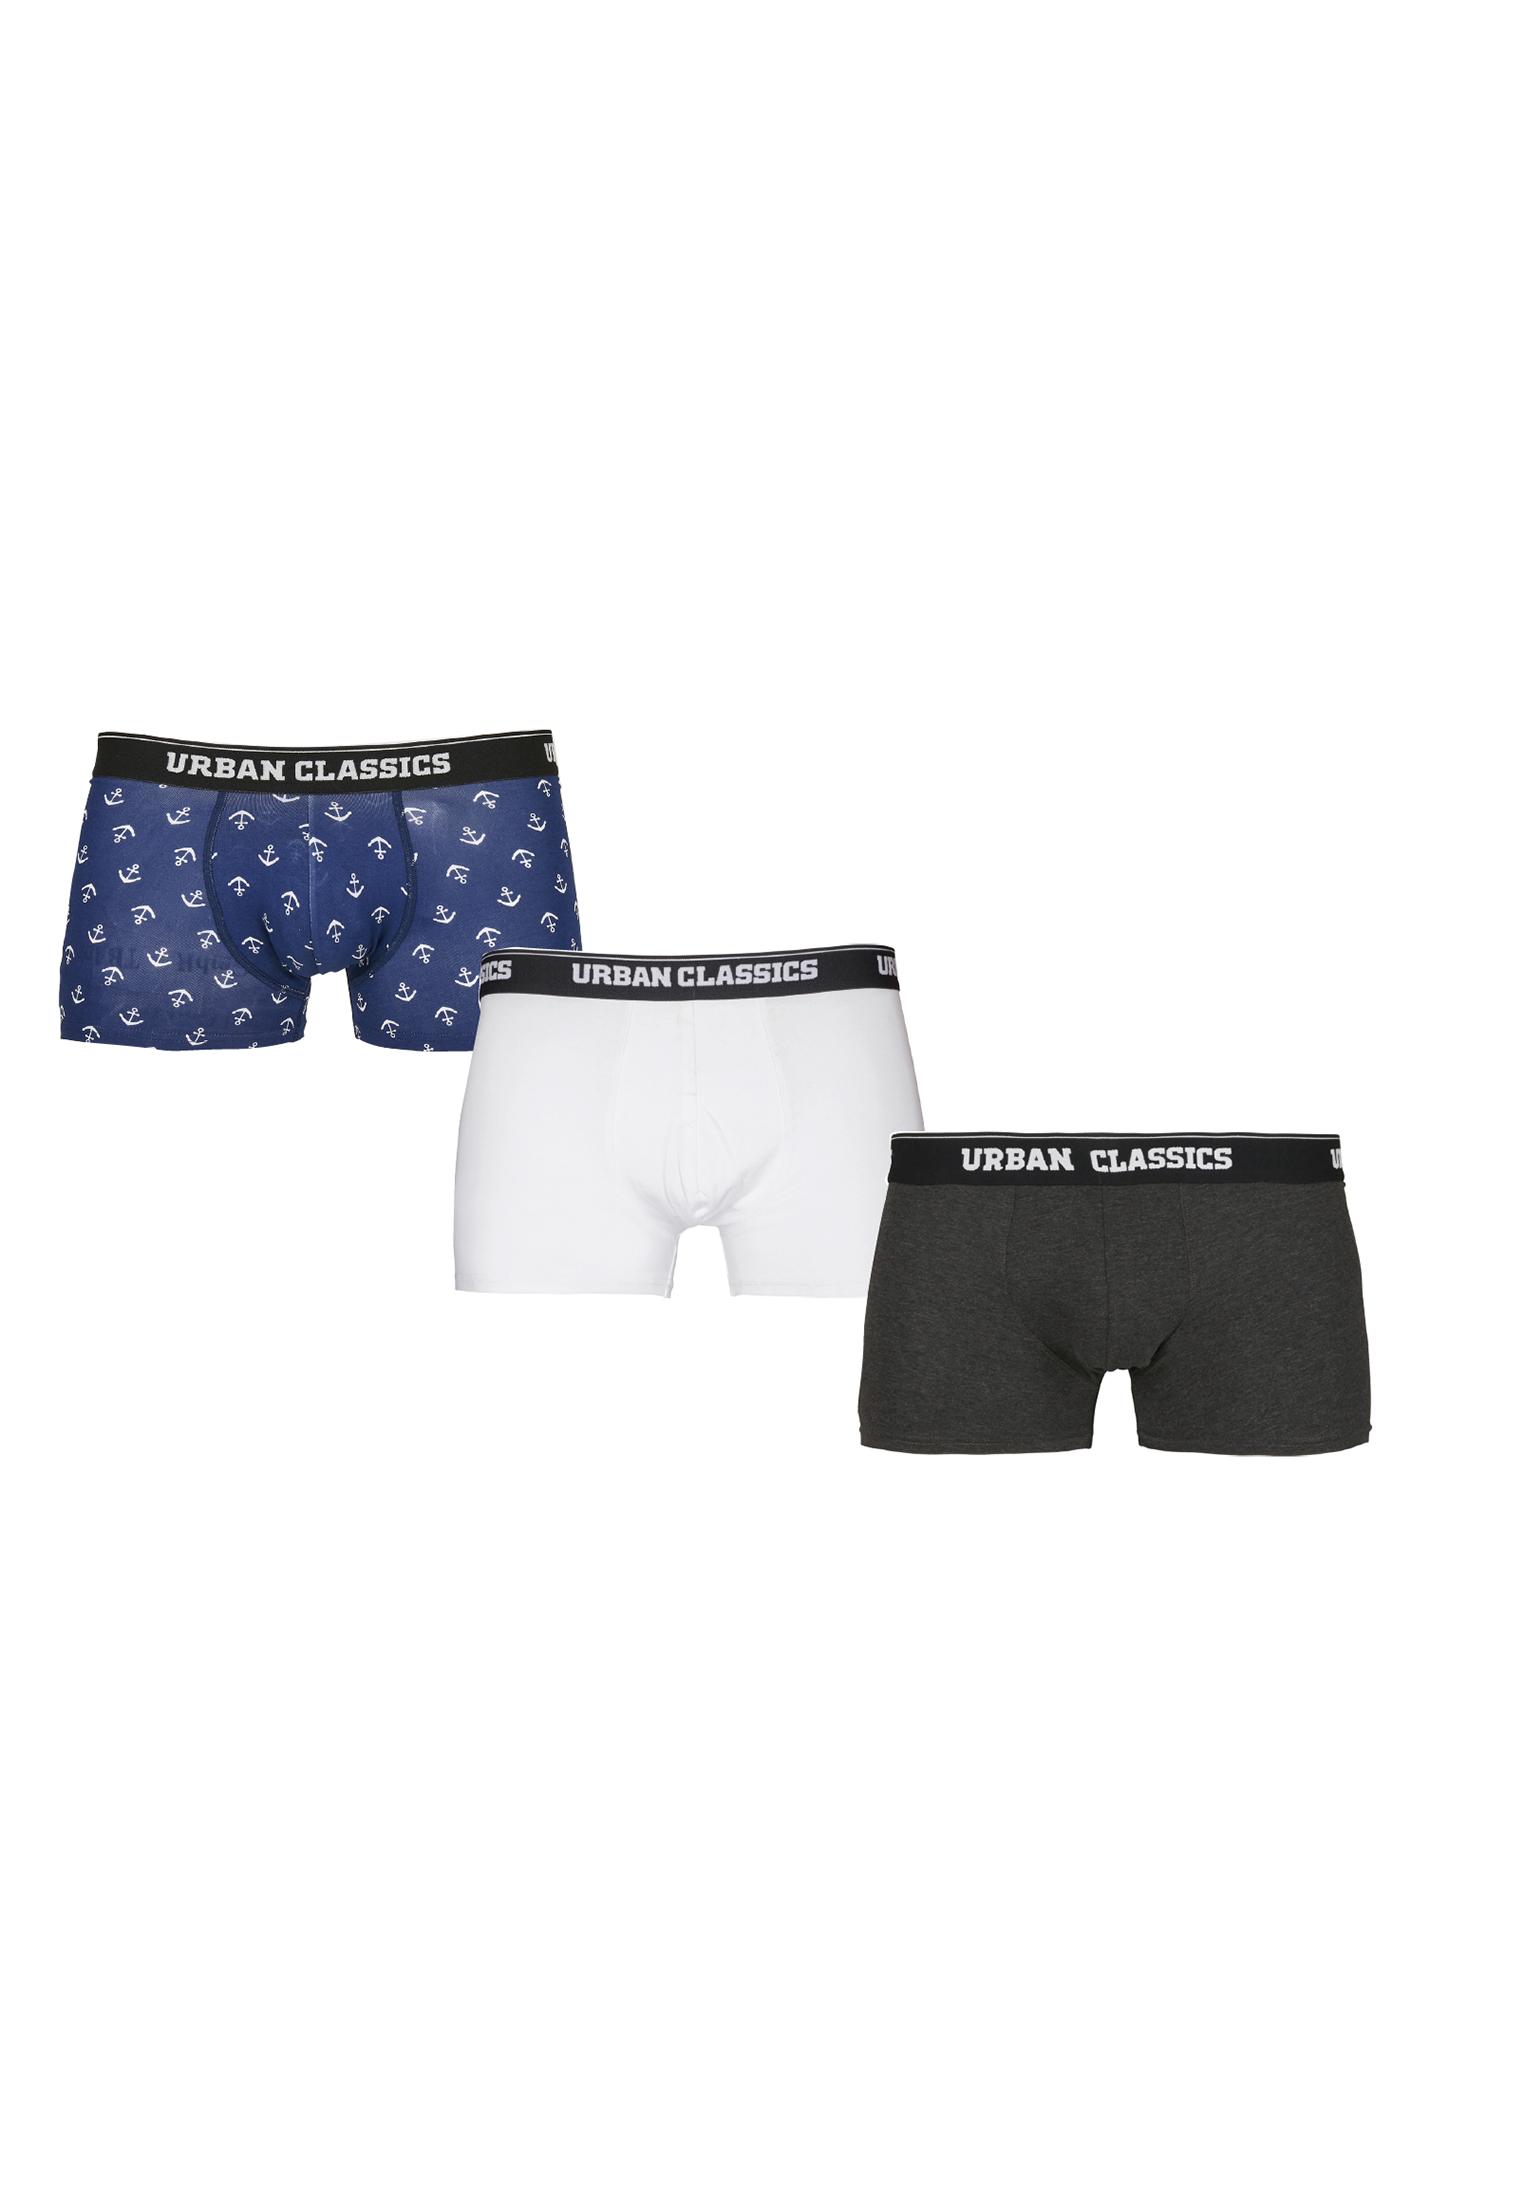 Urban Classics Boxer Shorts 3-Pack anchor aop+wht+cha - 3XL